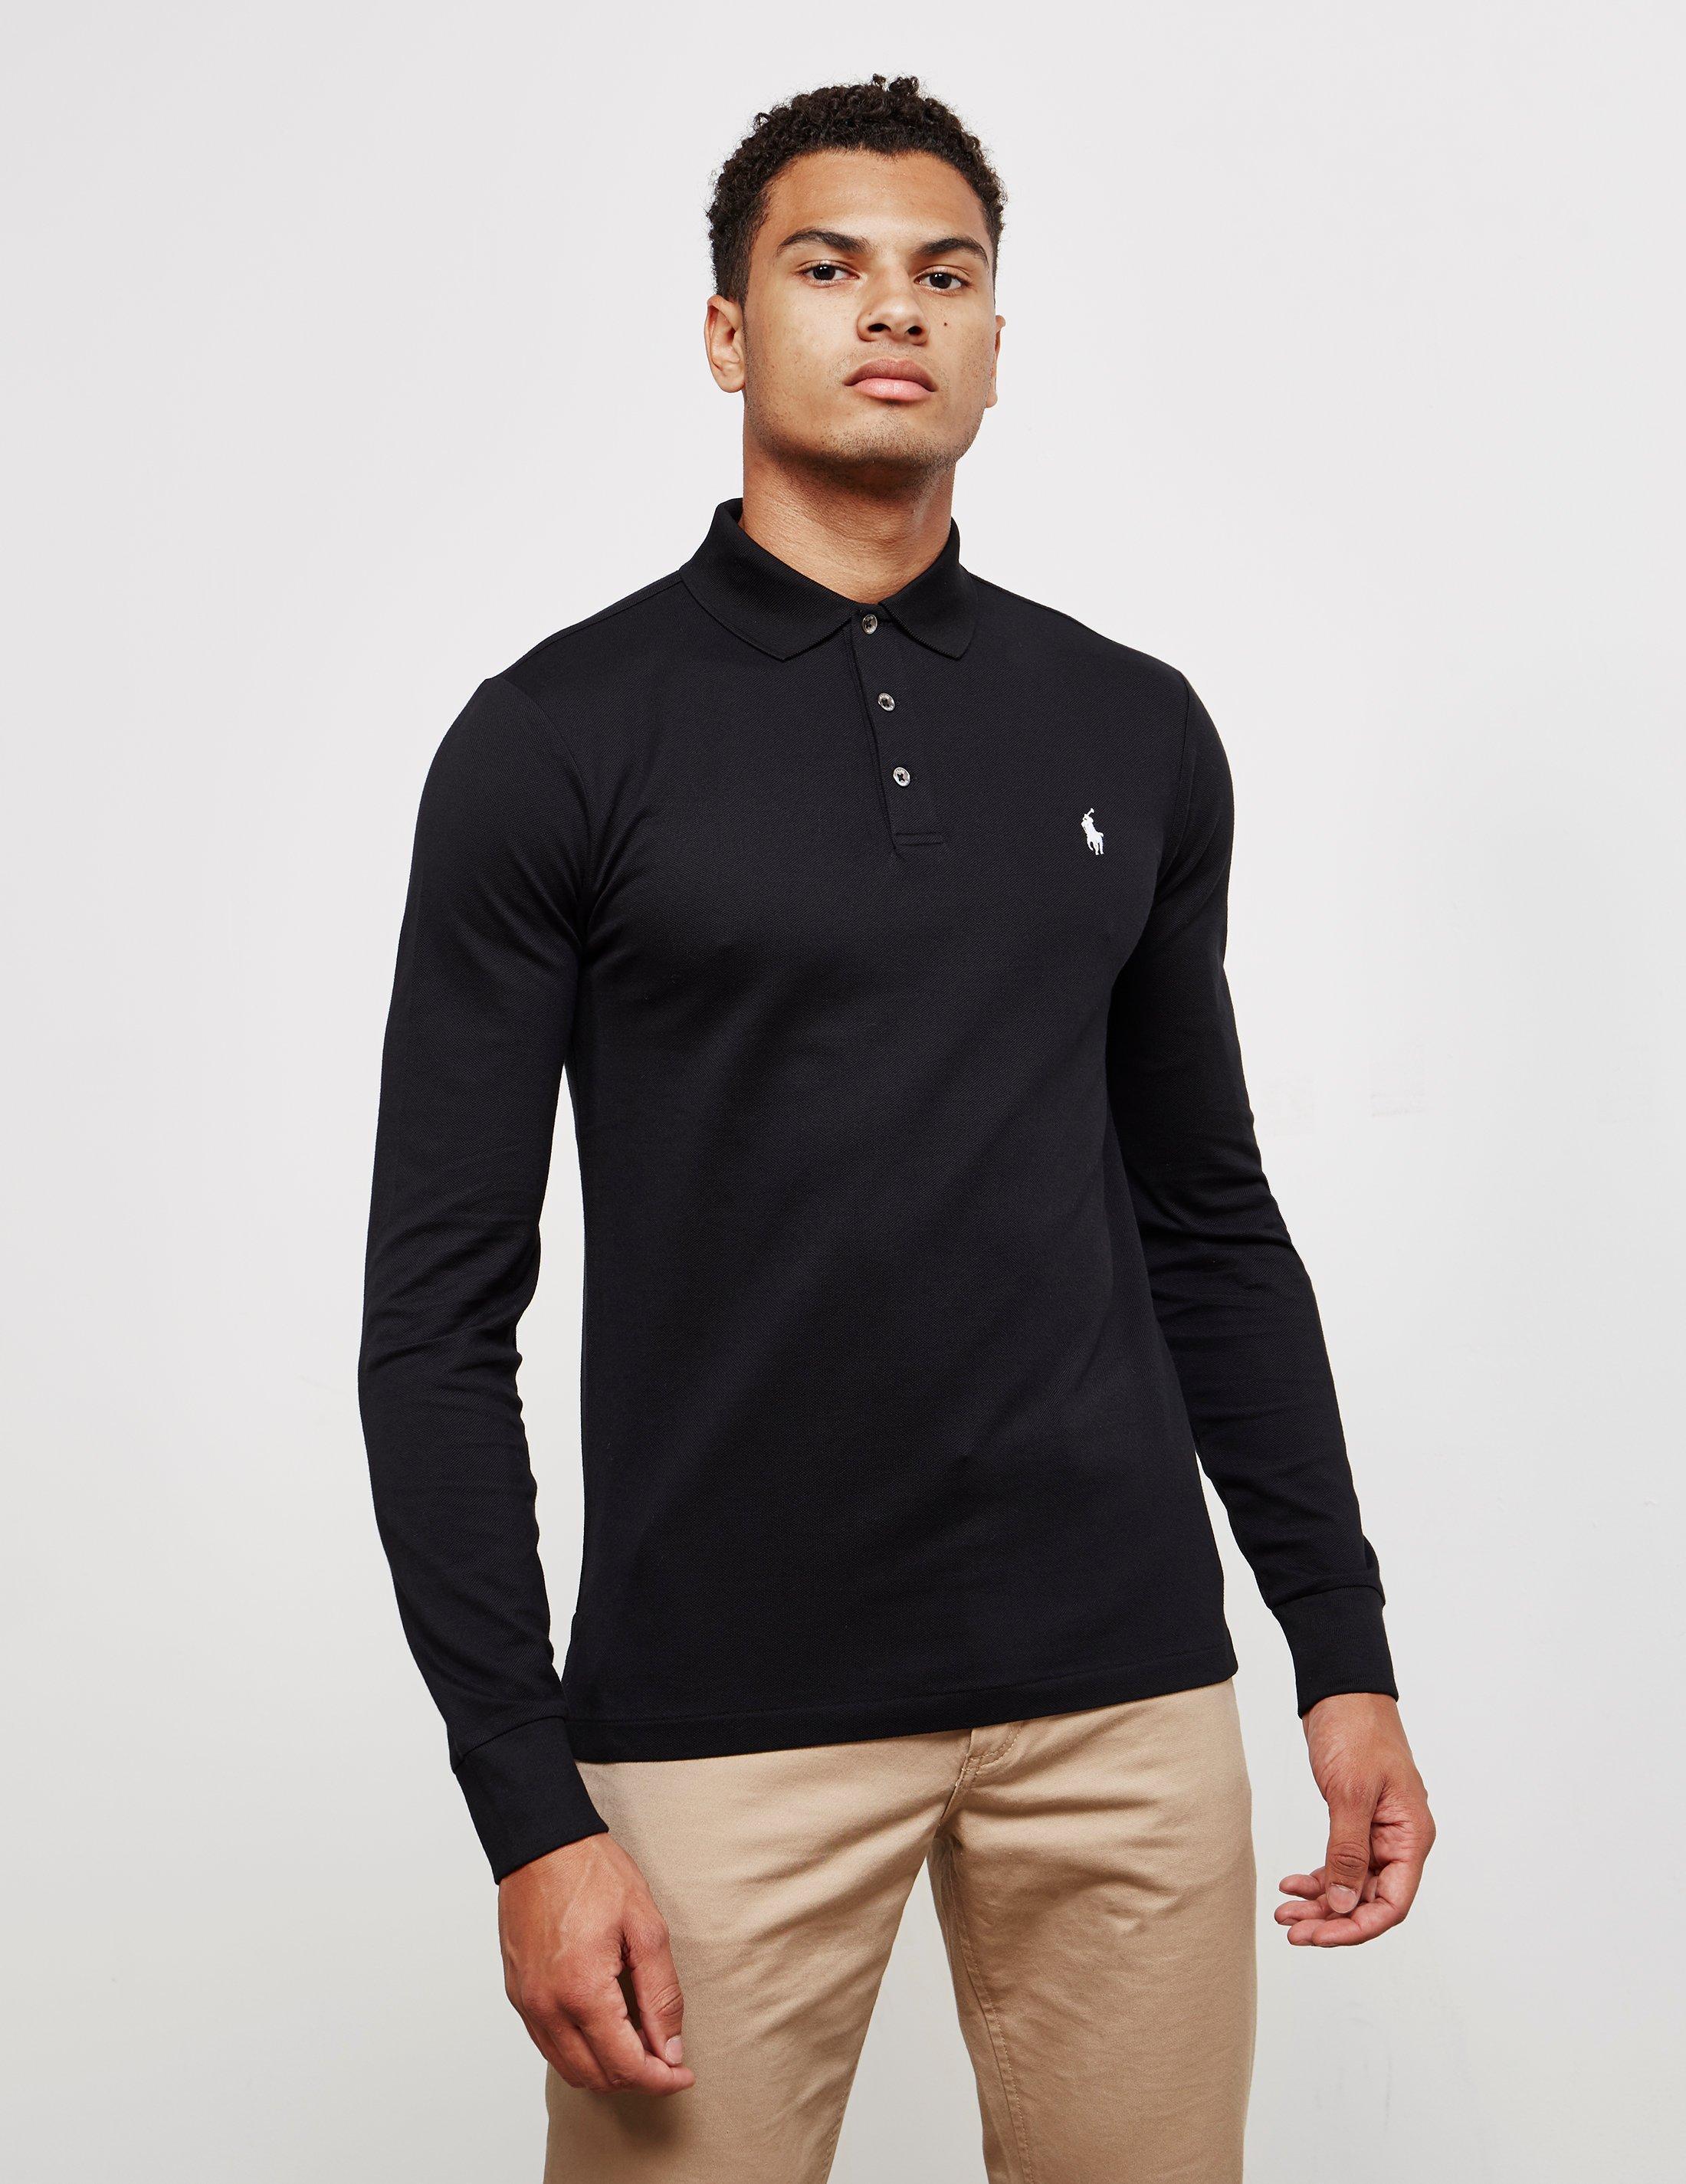 cf15e7d310f0 Polo Ralph Lauren Stretch Long Sleeve Polo Shirt Black in Black for ...